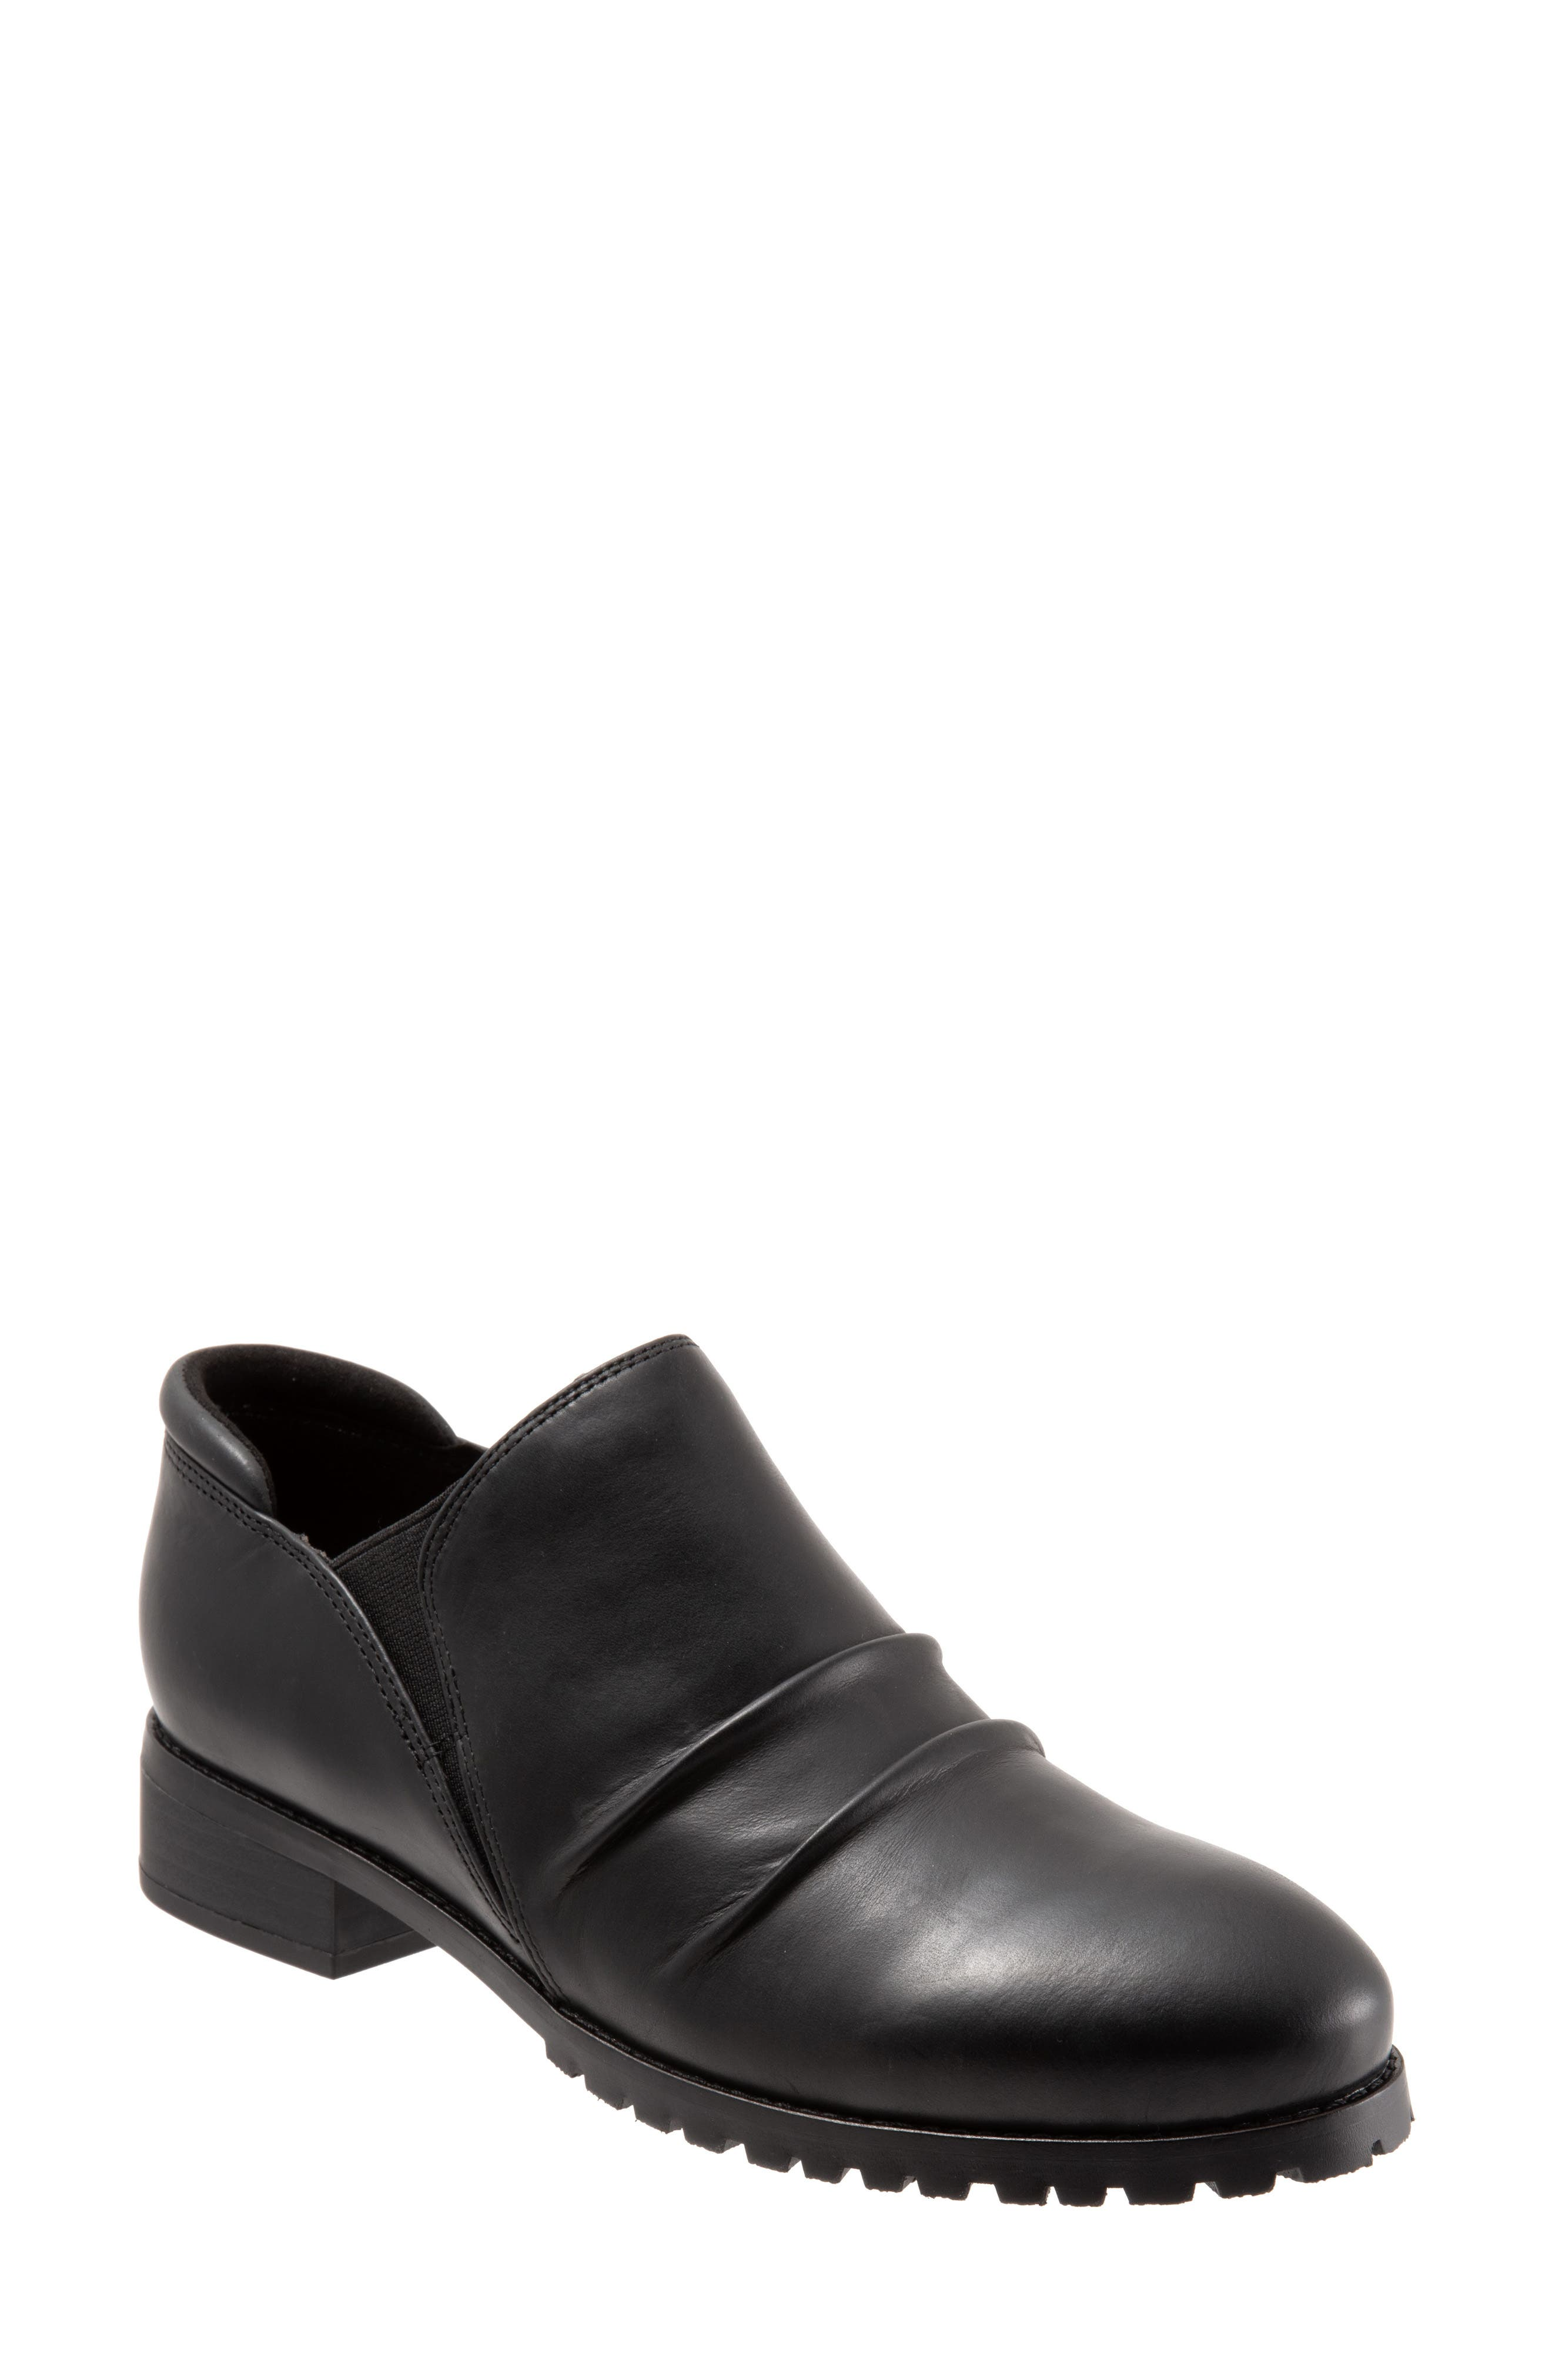 Softwalk Mara Ankle Boot- Black